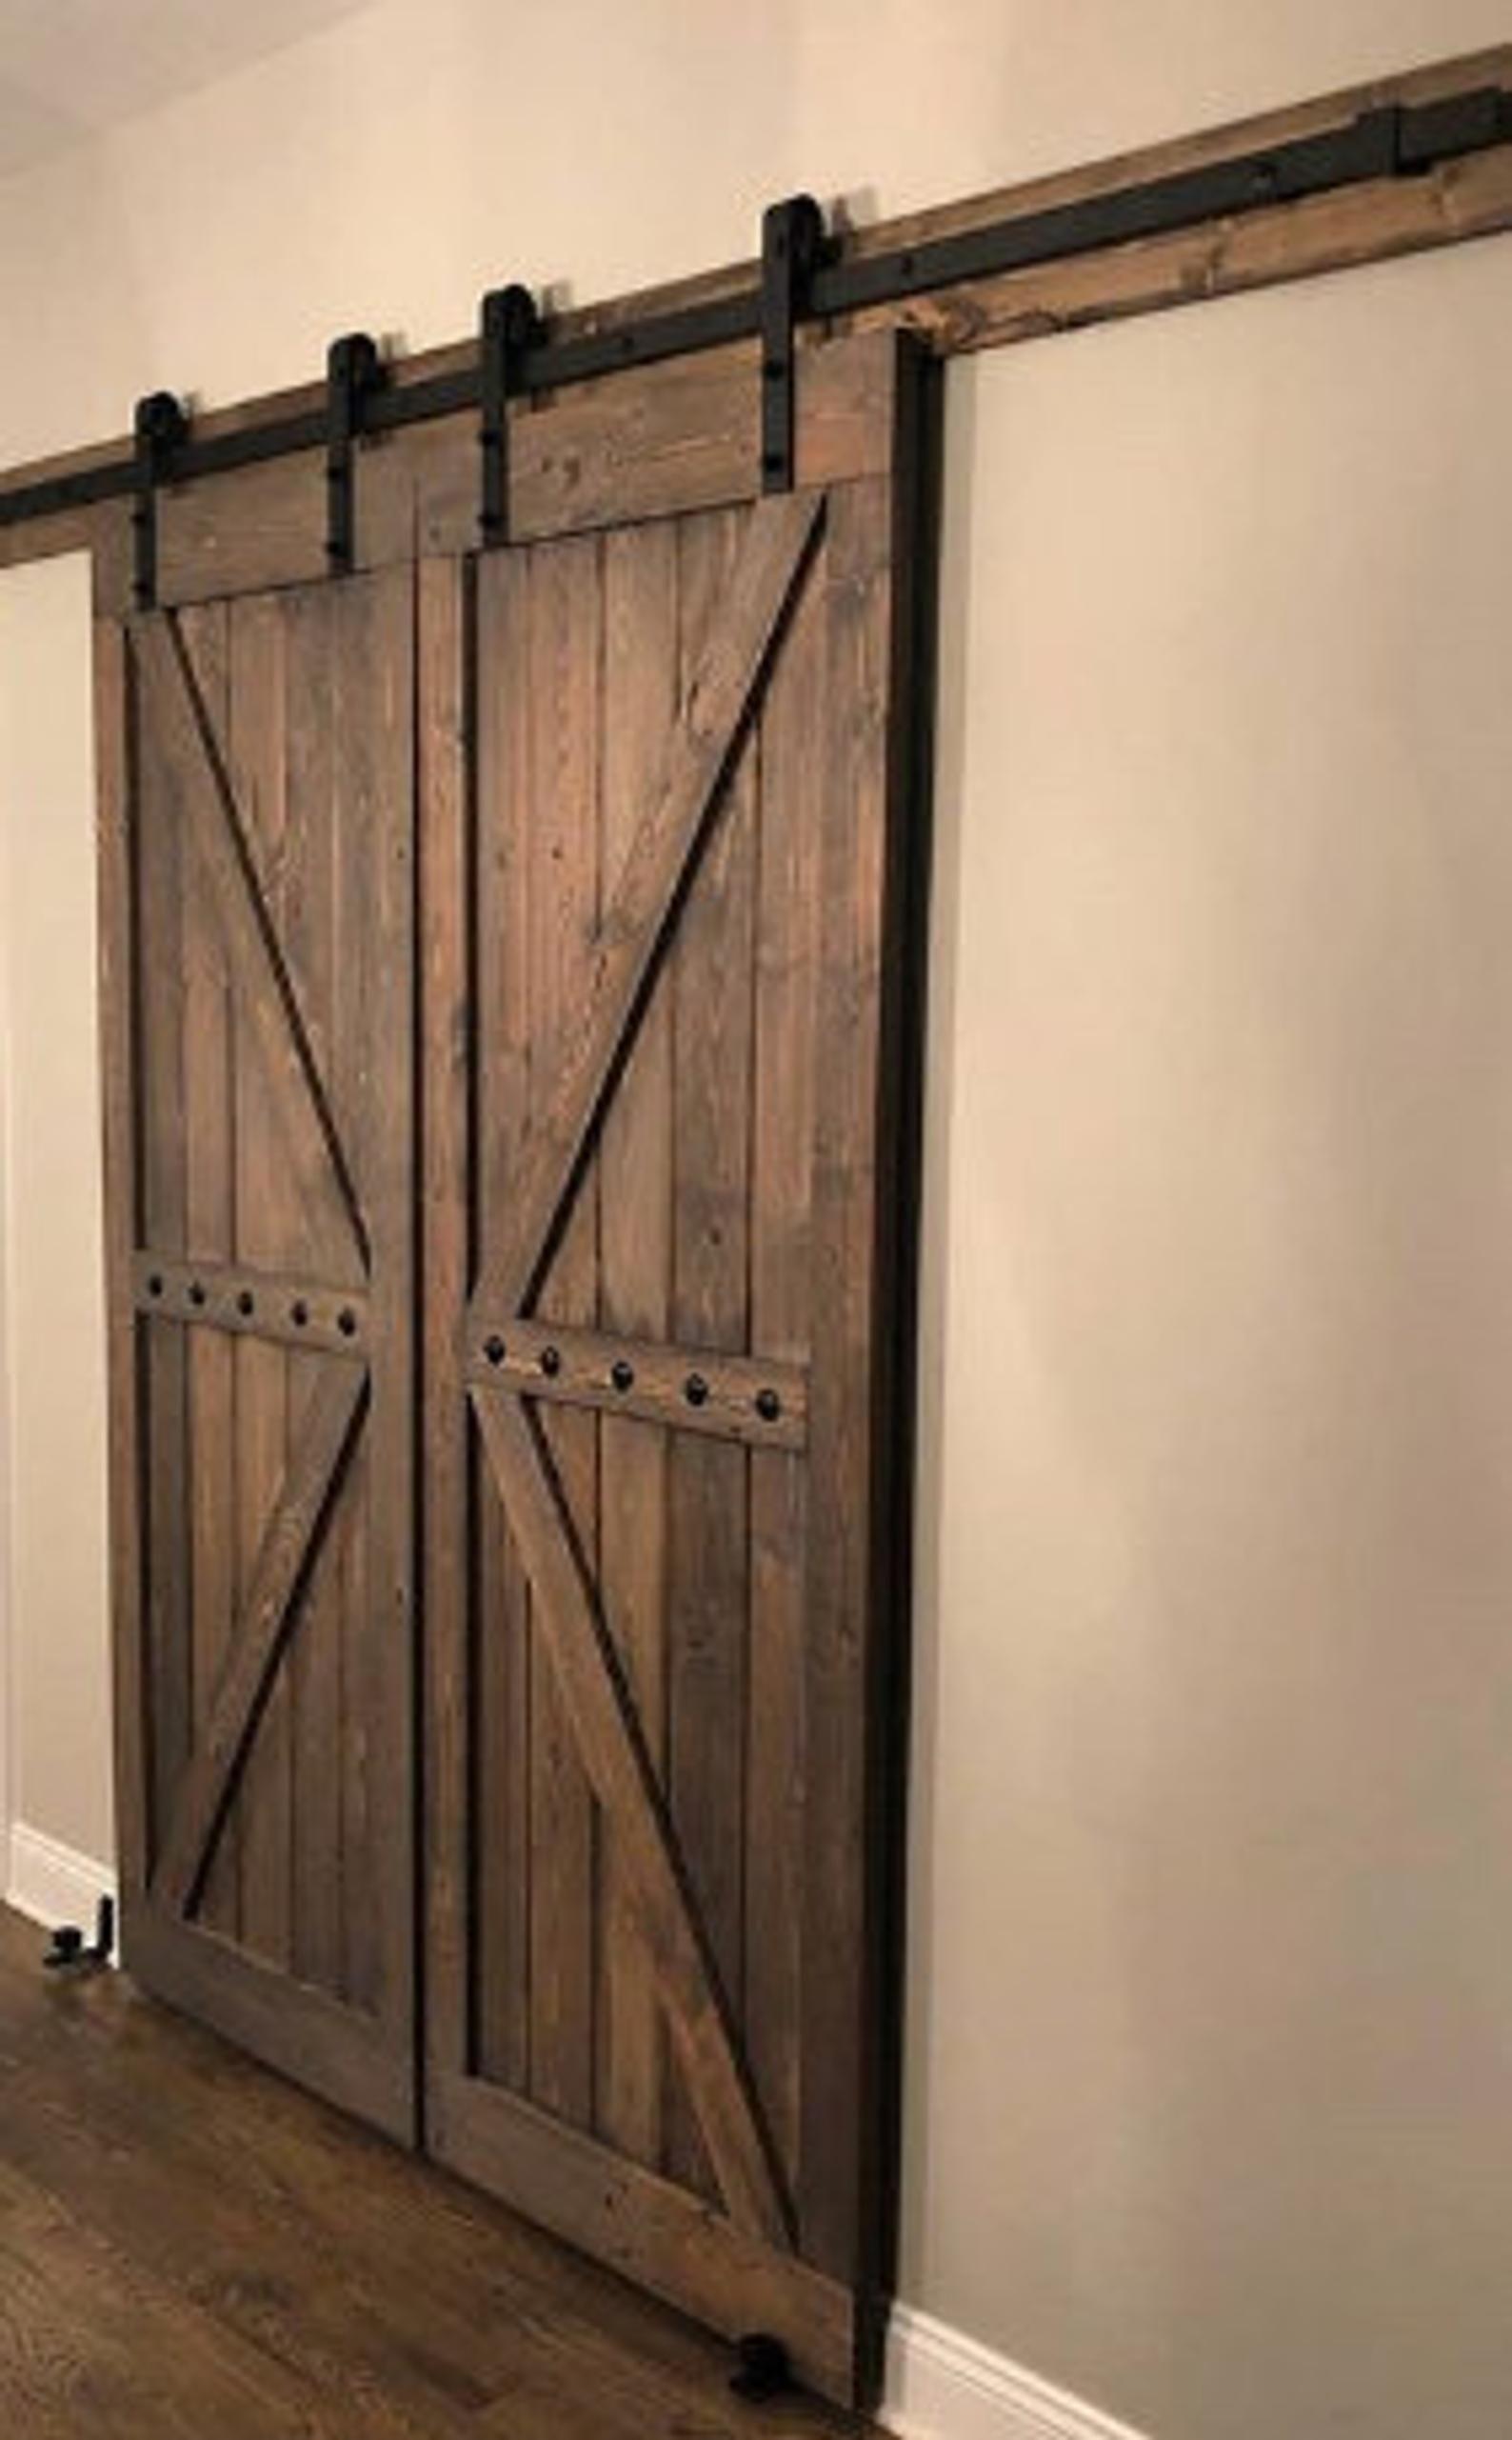 Double British Brace Barn Door Sliding Set With Hardware Farmhouse Style Barn Doors 84x36 Any Size Available Wood Doors Interior Barn Door Double Barn Doors